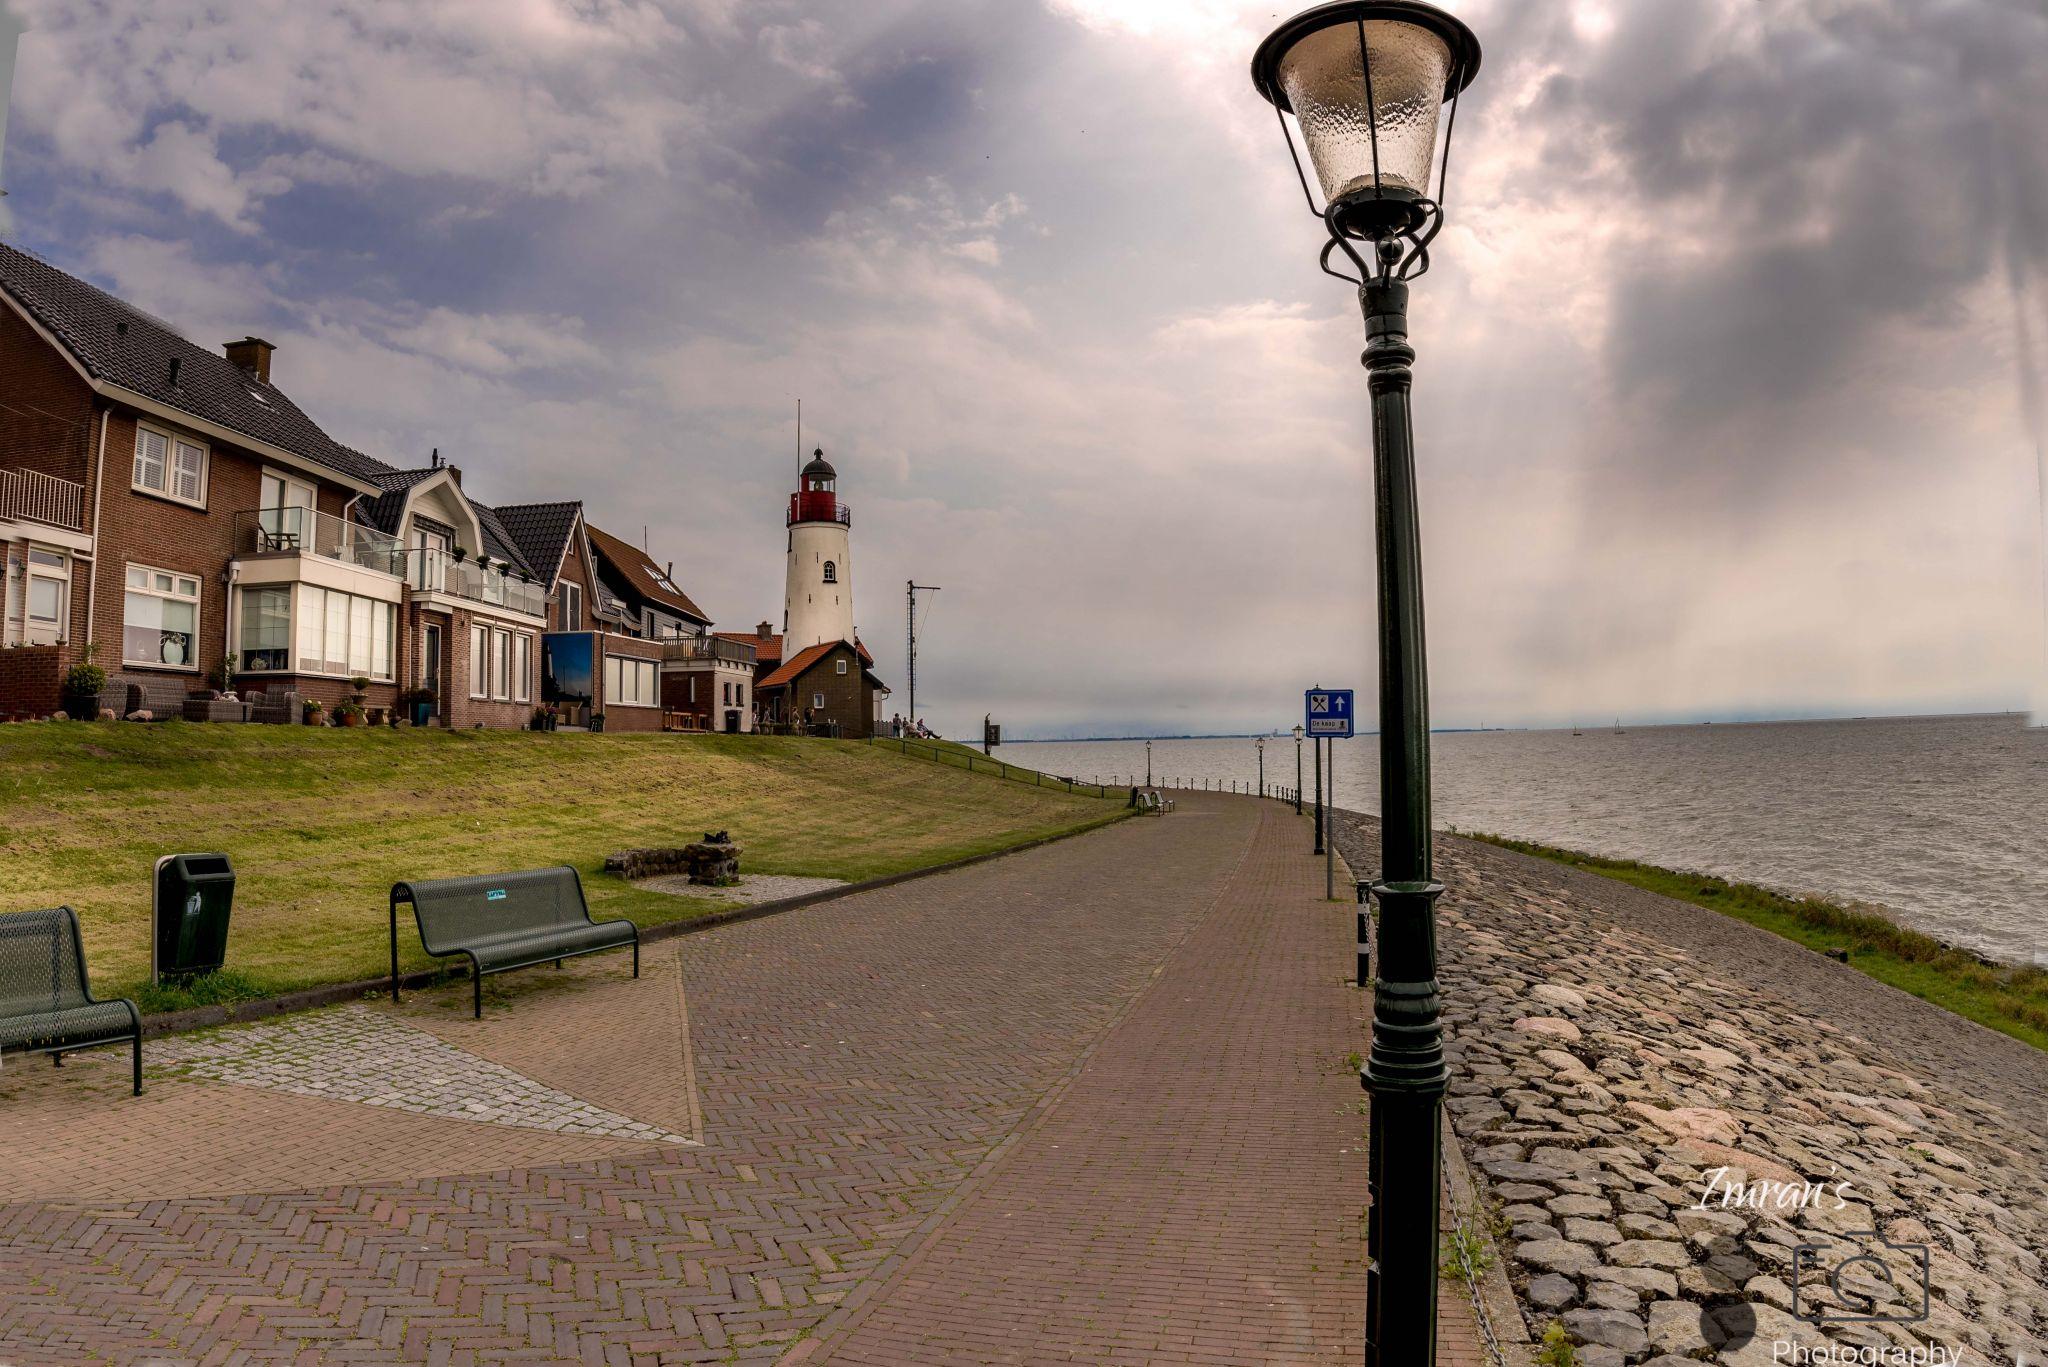 Urk Light House, Netherlands